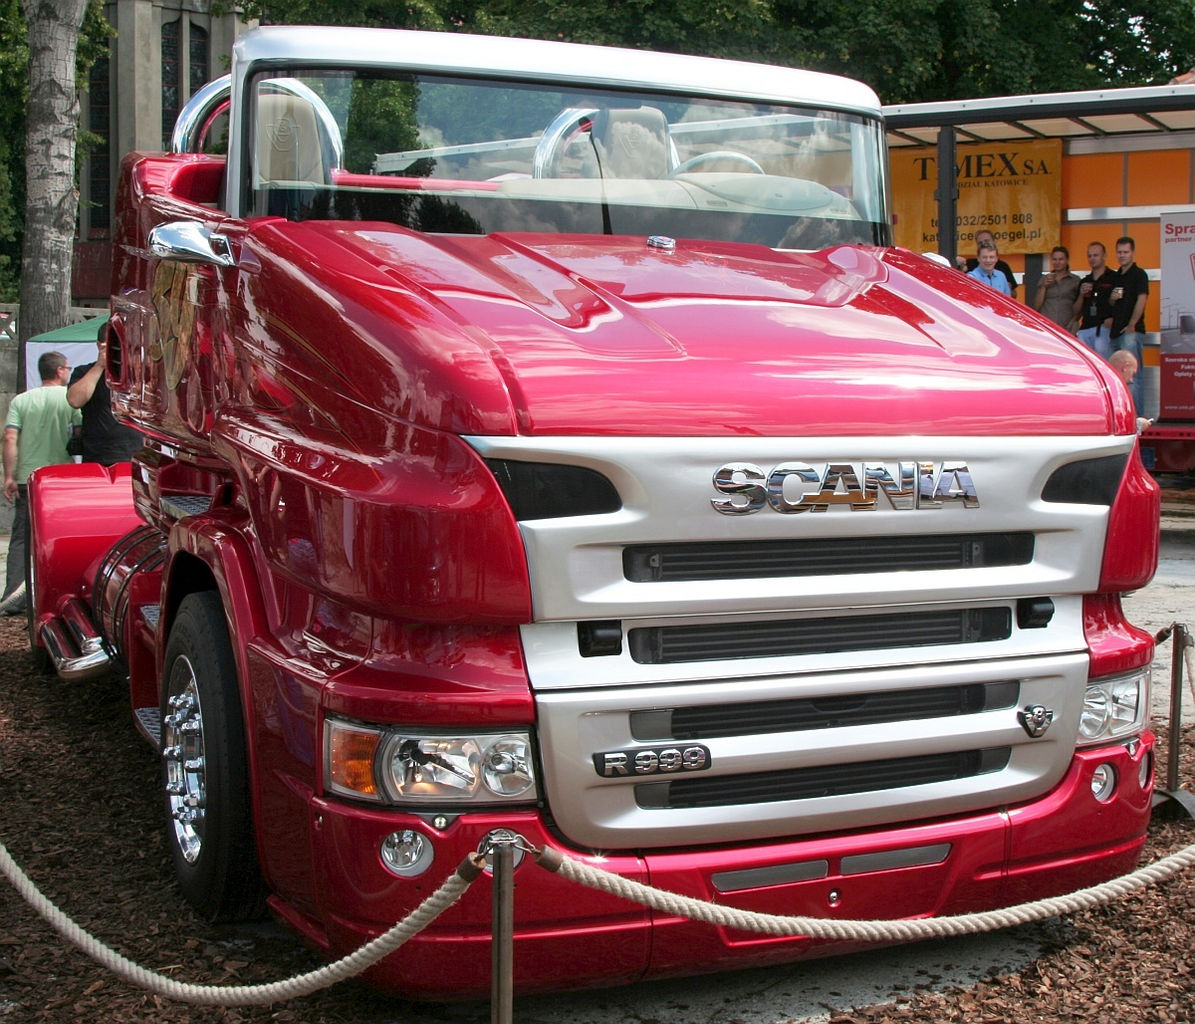 Scania_R999_Svempas_by_remigiuszScout.jpg